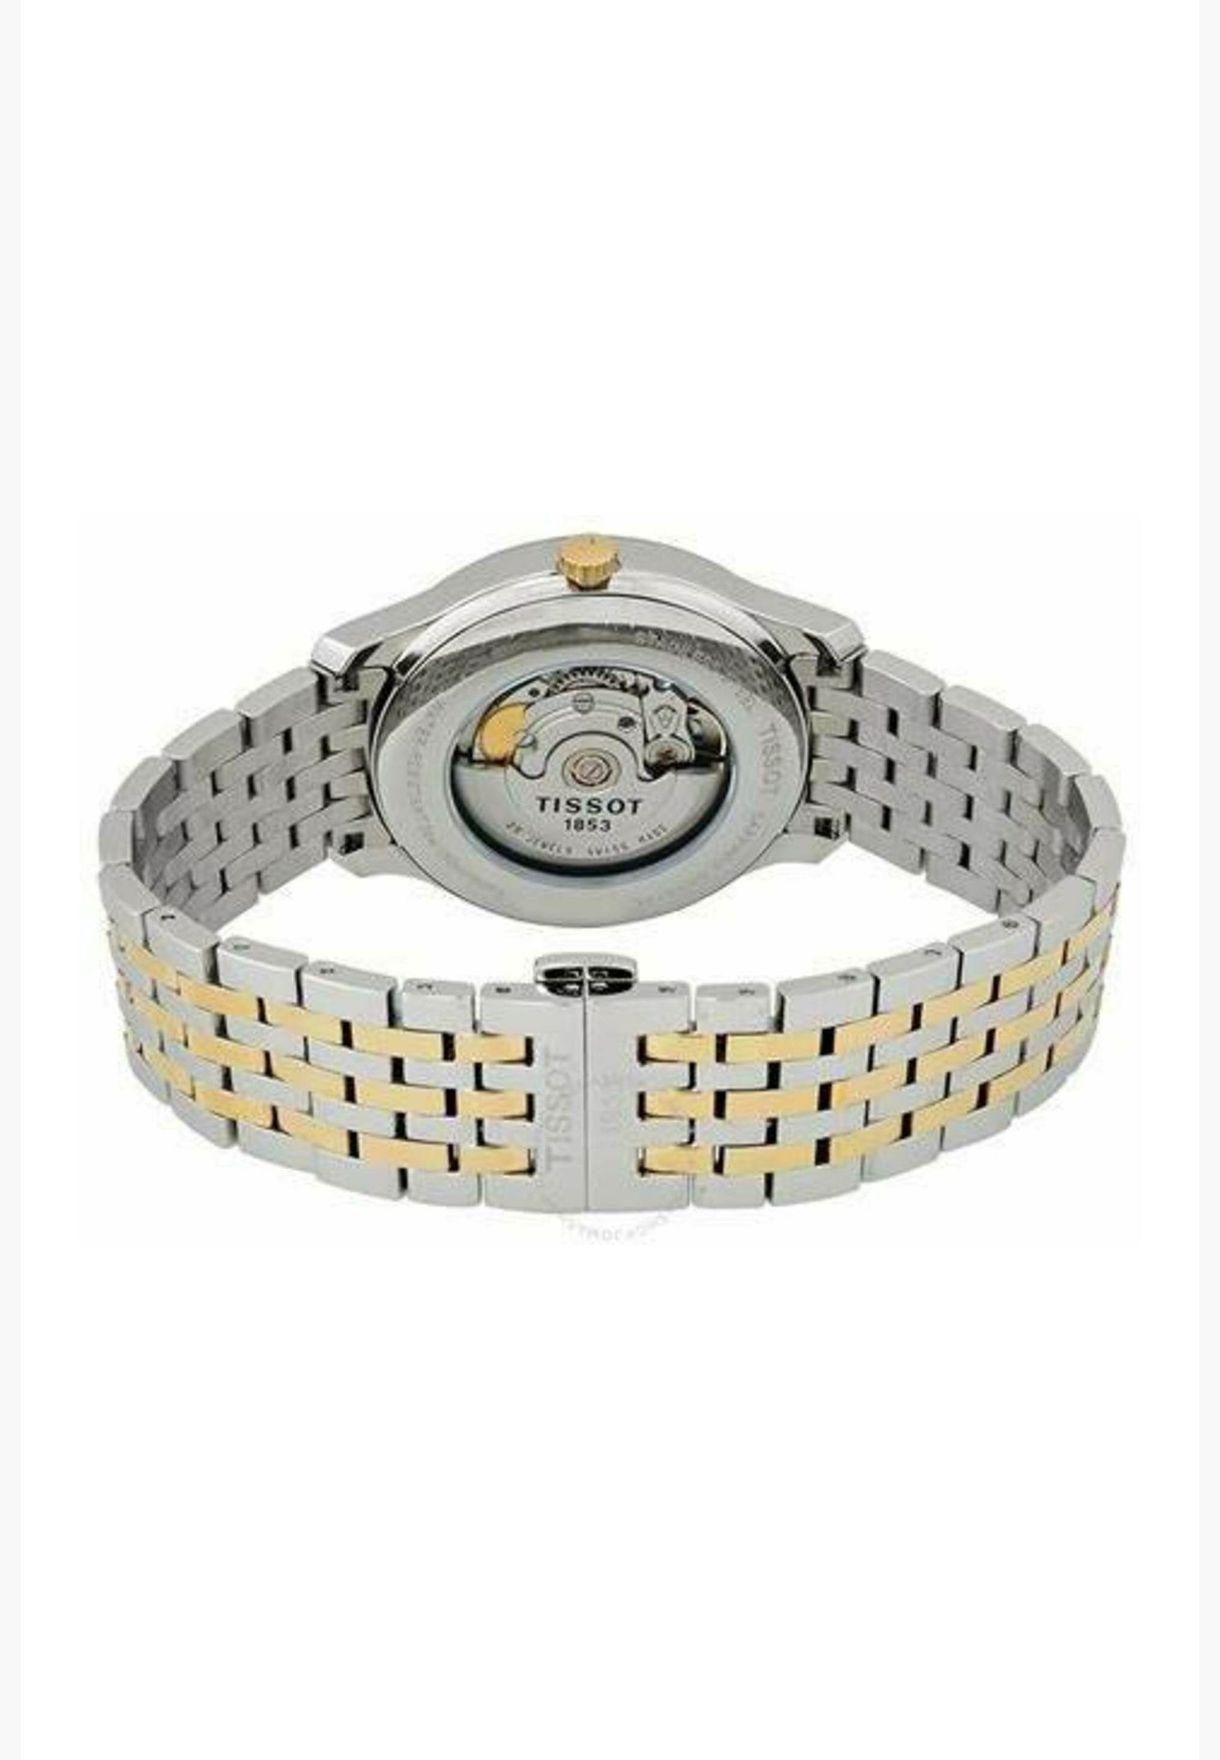 Tissot Tissot Tradition Steel Strap Watch - T063.428.22.038.00